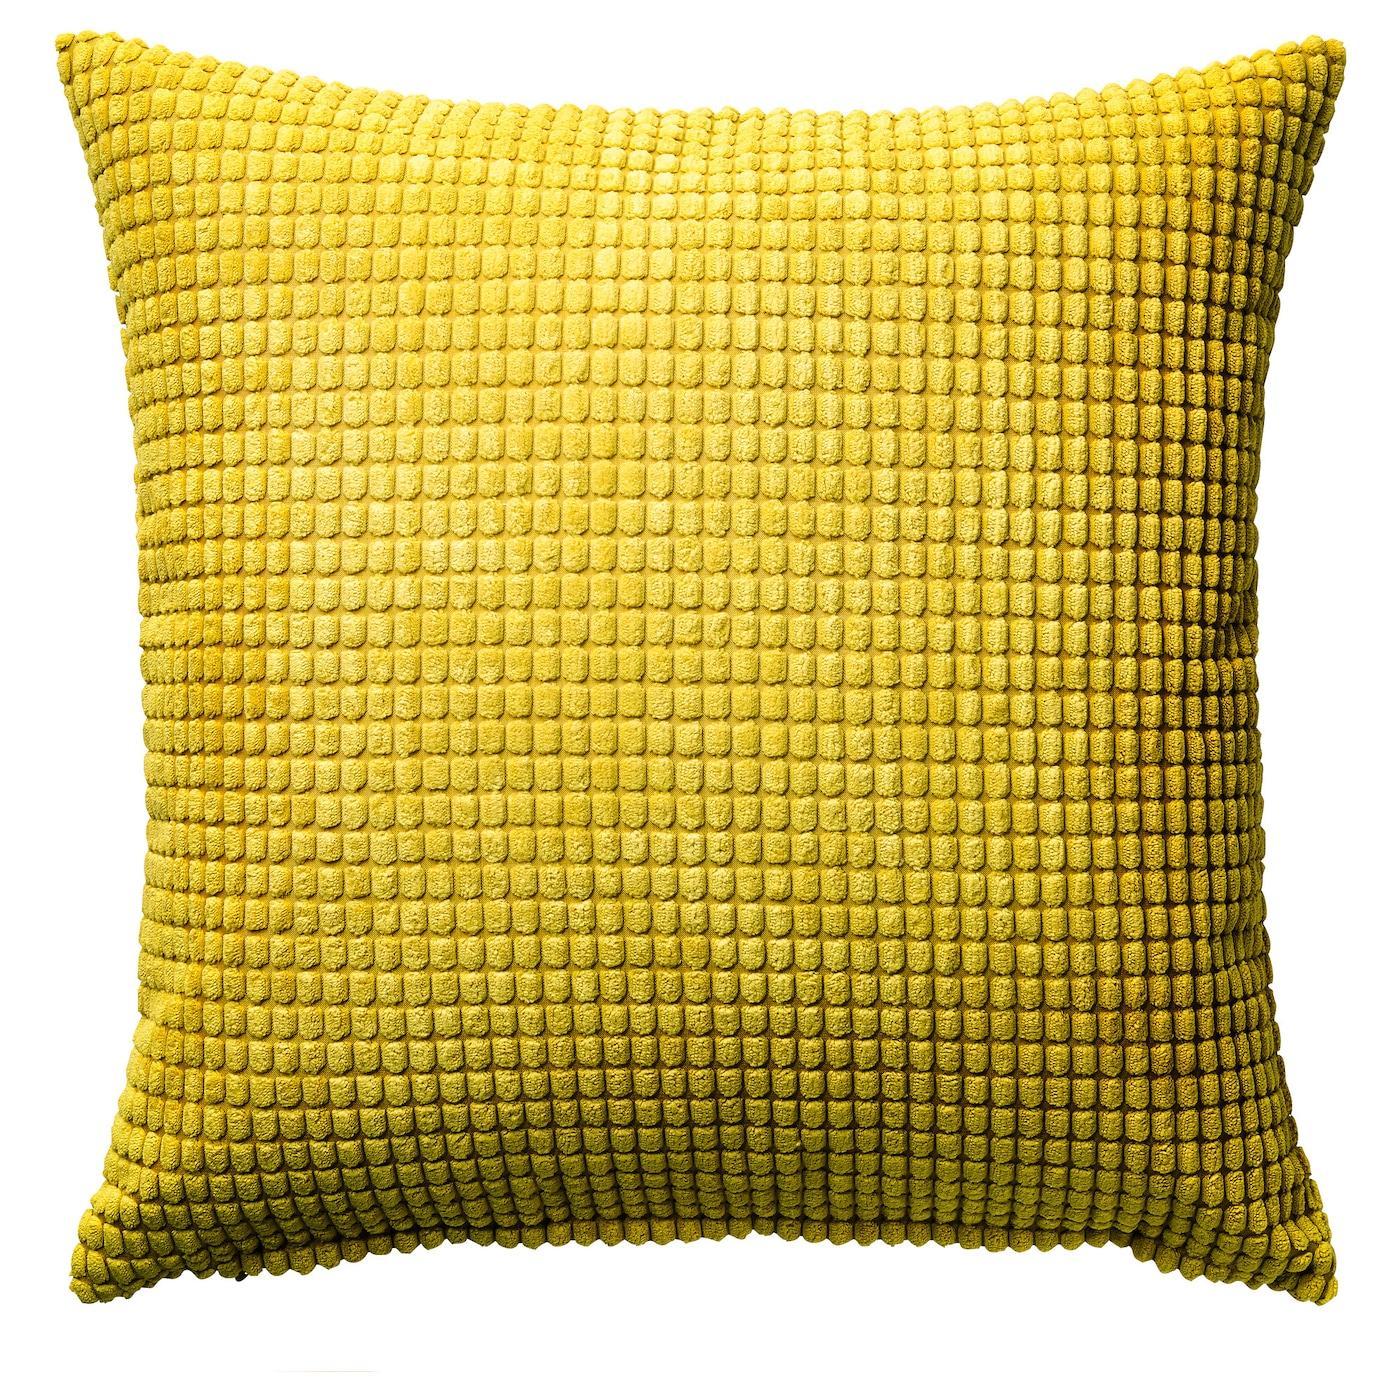 Gullklocka Cushion Cover Yellow 50x50 Cm Ikea